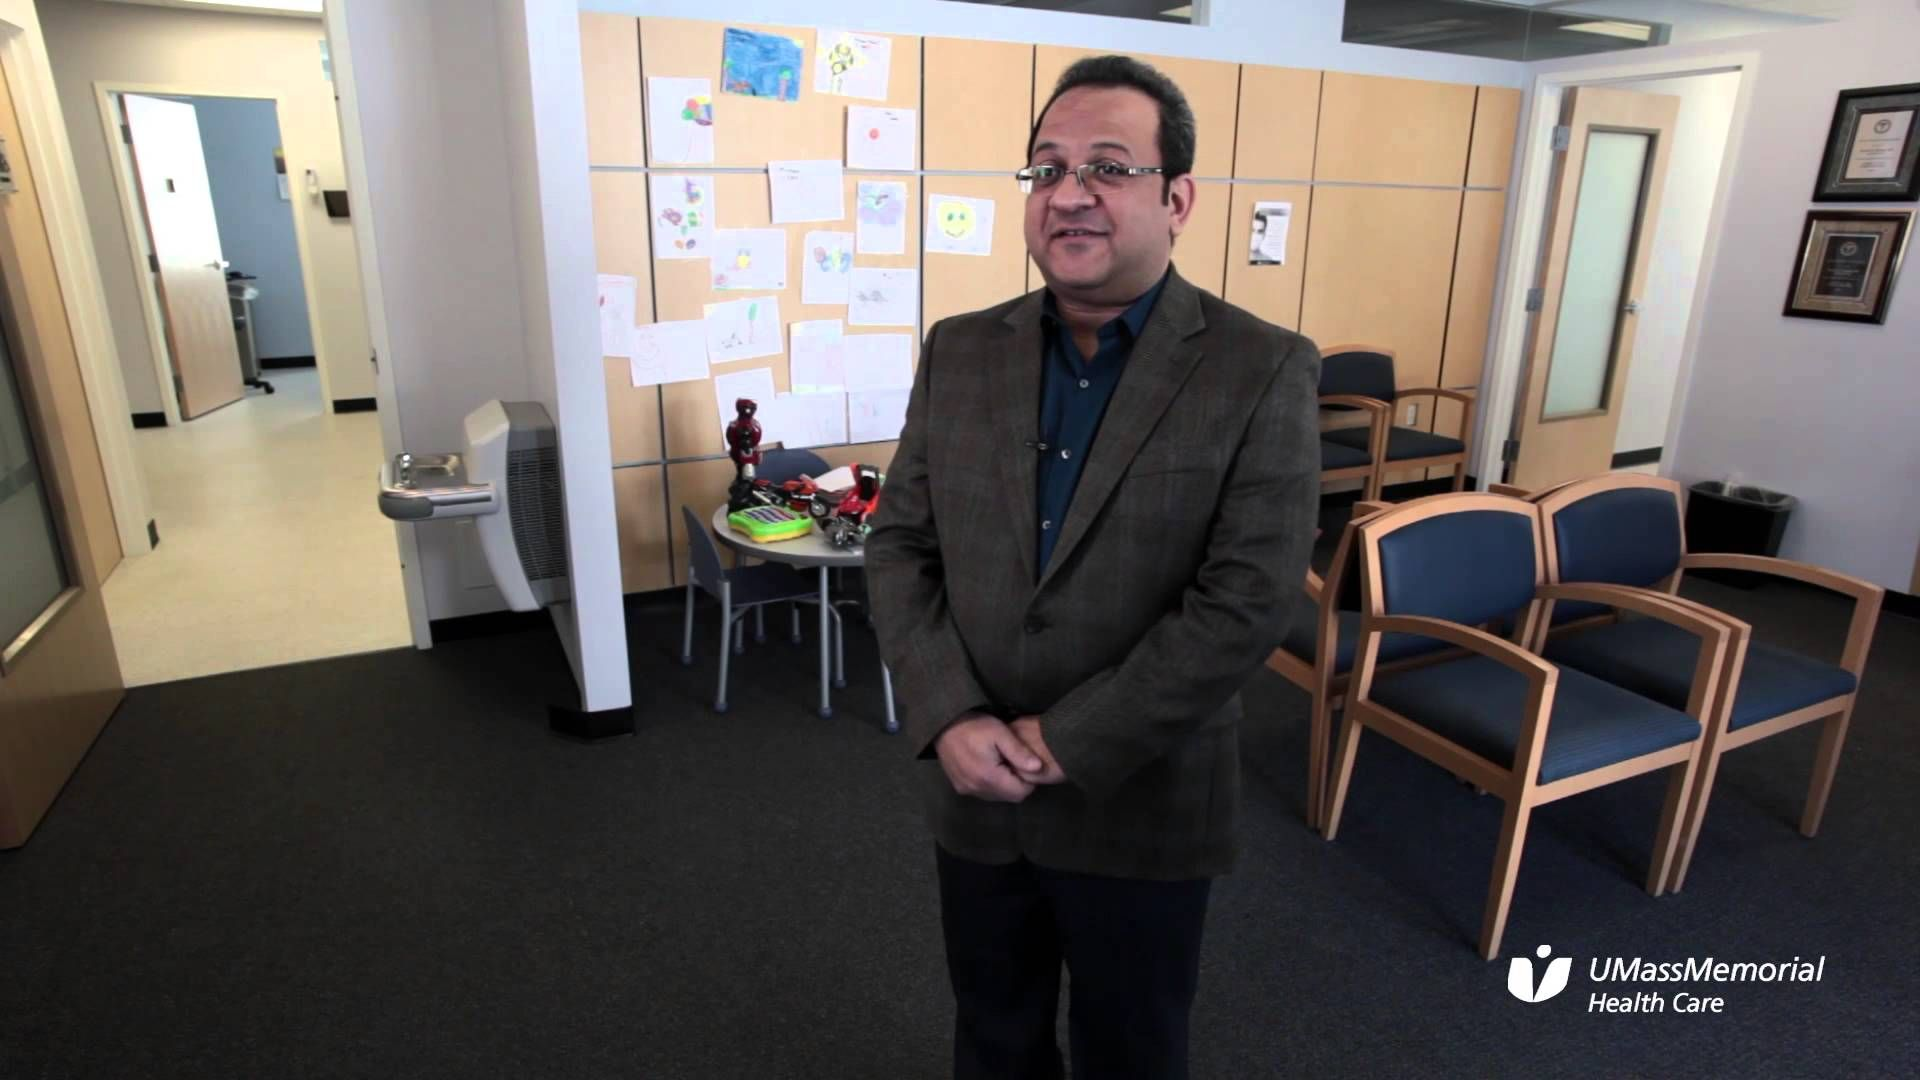 Meet Bassem Hanna, MD UMass Memorial Health Care